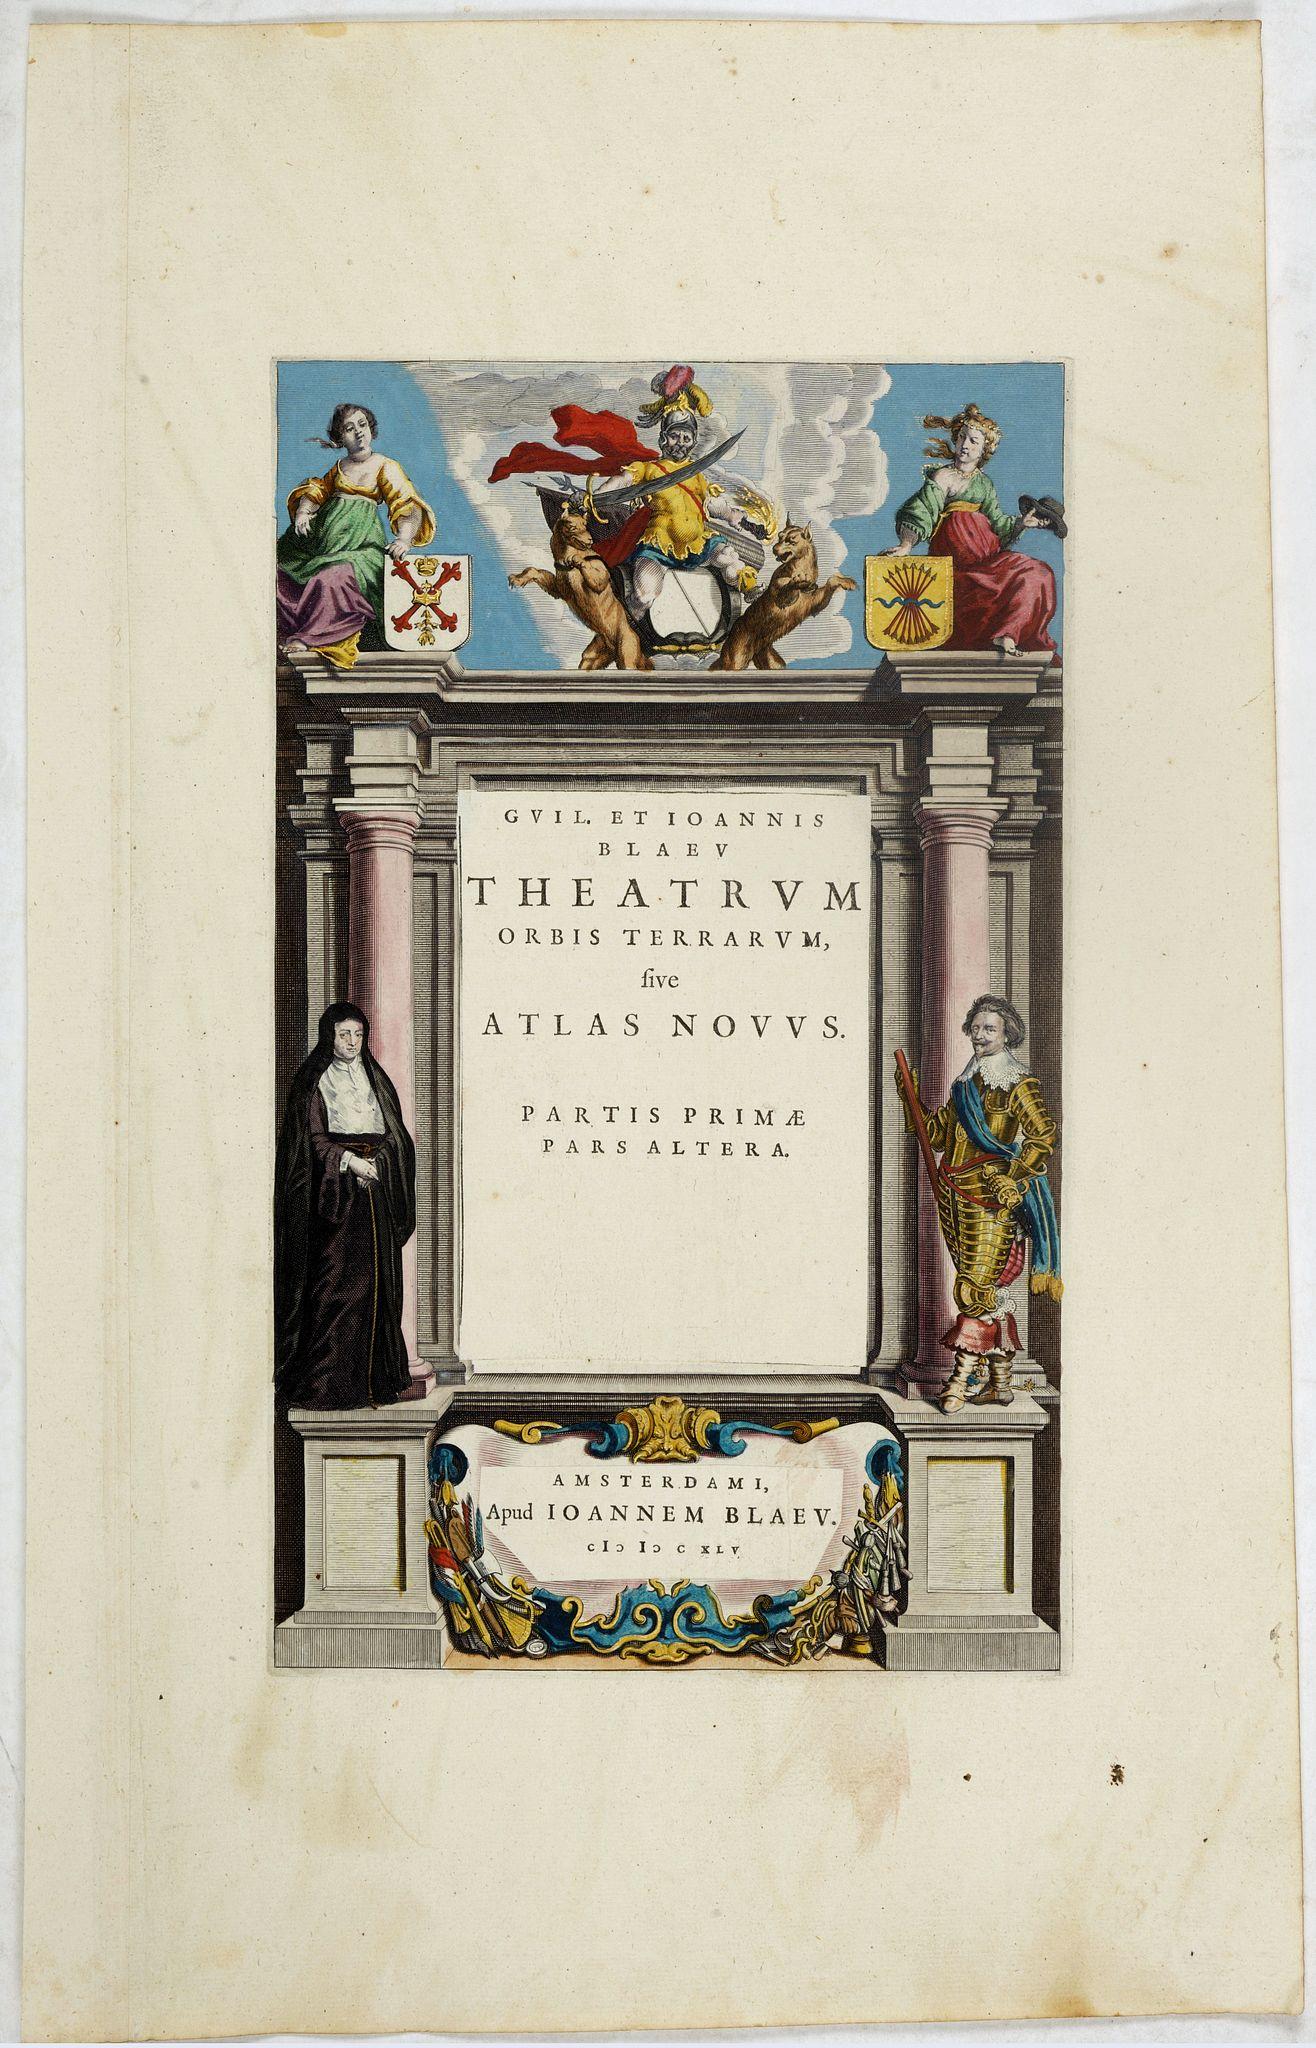 BLAEU, J. -  Title page from Theatrum Orbis Terrarum sive Atlas Novus Partis Prime Pars Altera.